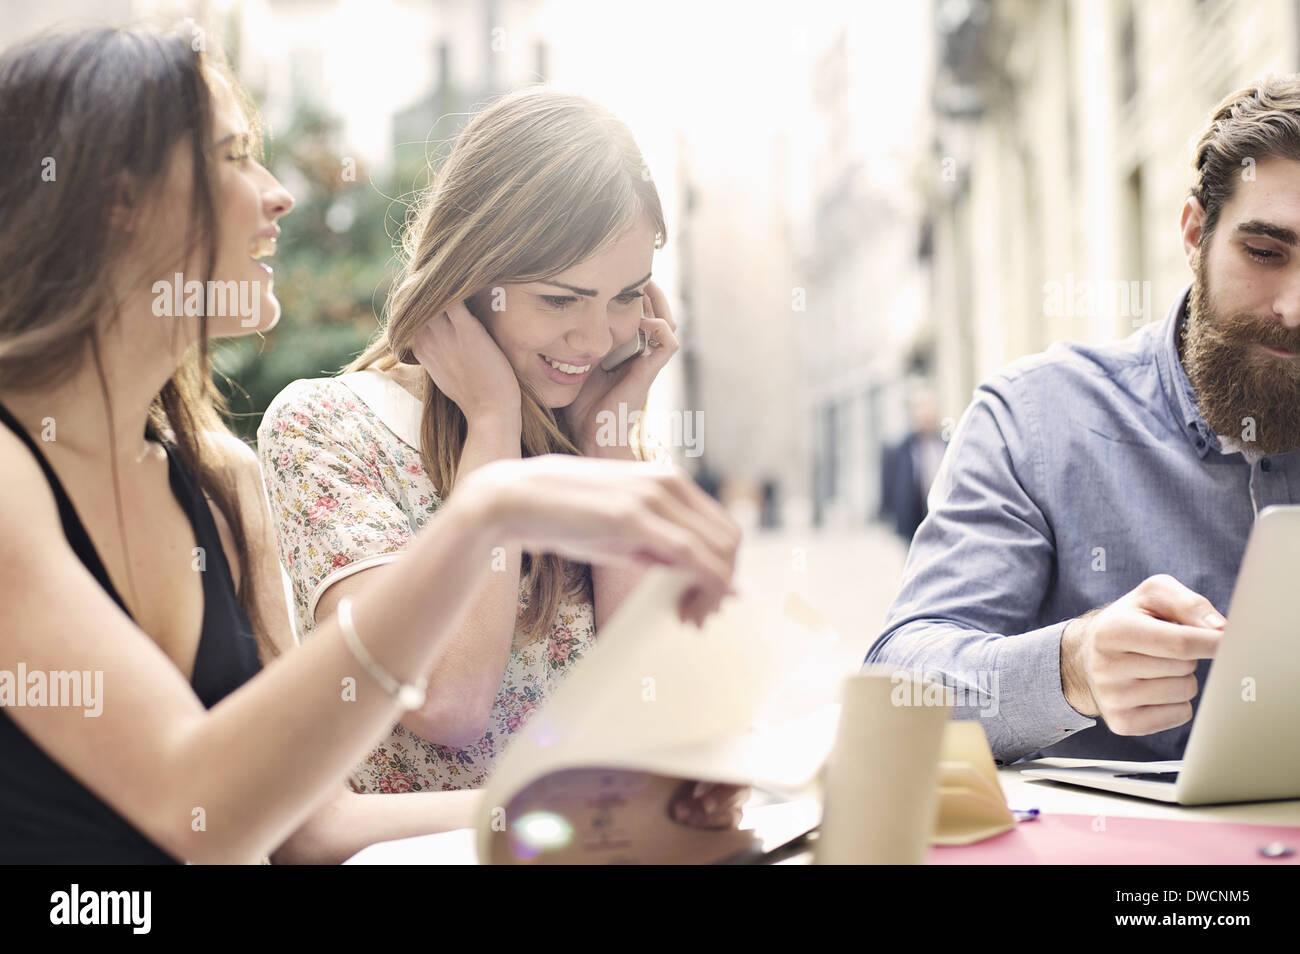 Three tourist friends enjoying a break at sidewalk cafe, Valencia, Spain - Stock Image